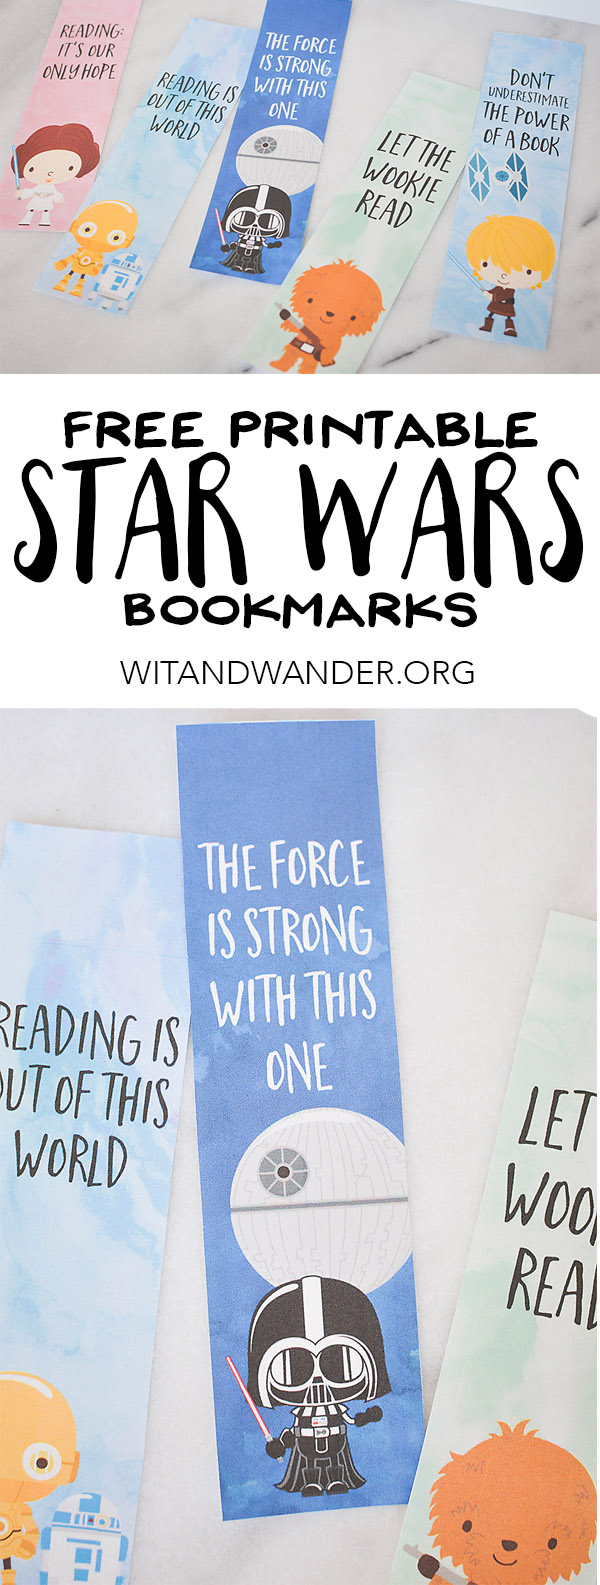 Free Printable Star Wars Bookmarks | Wit & Wander